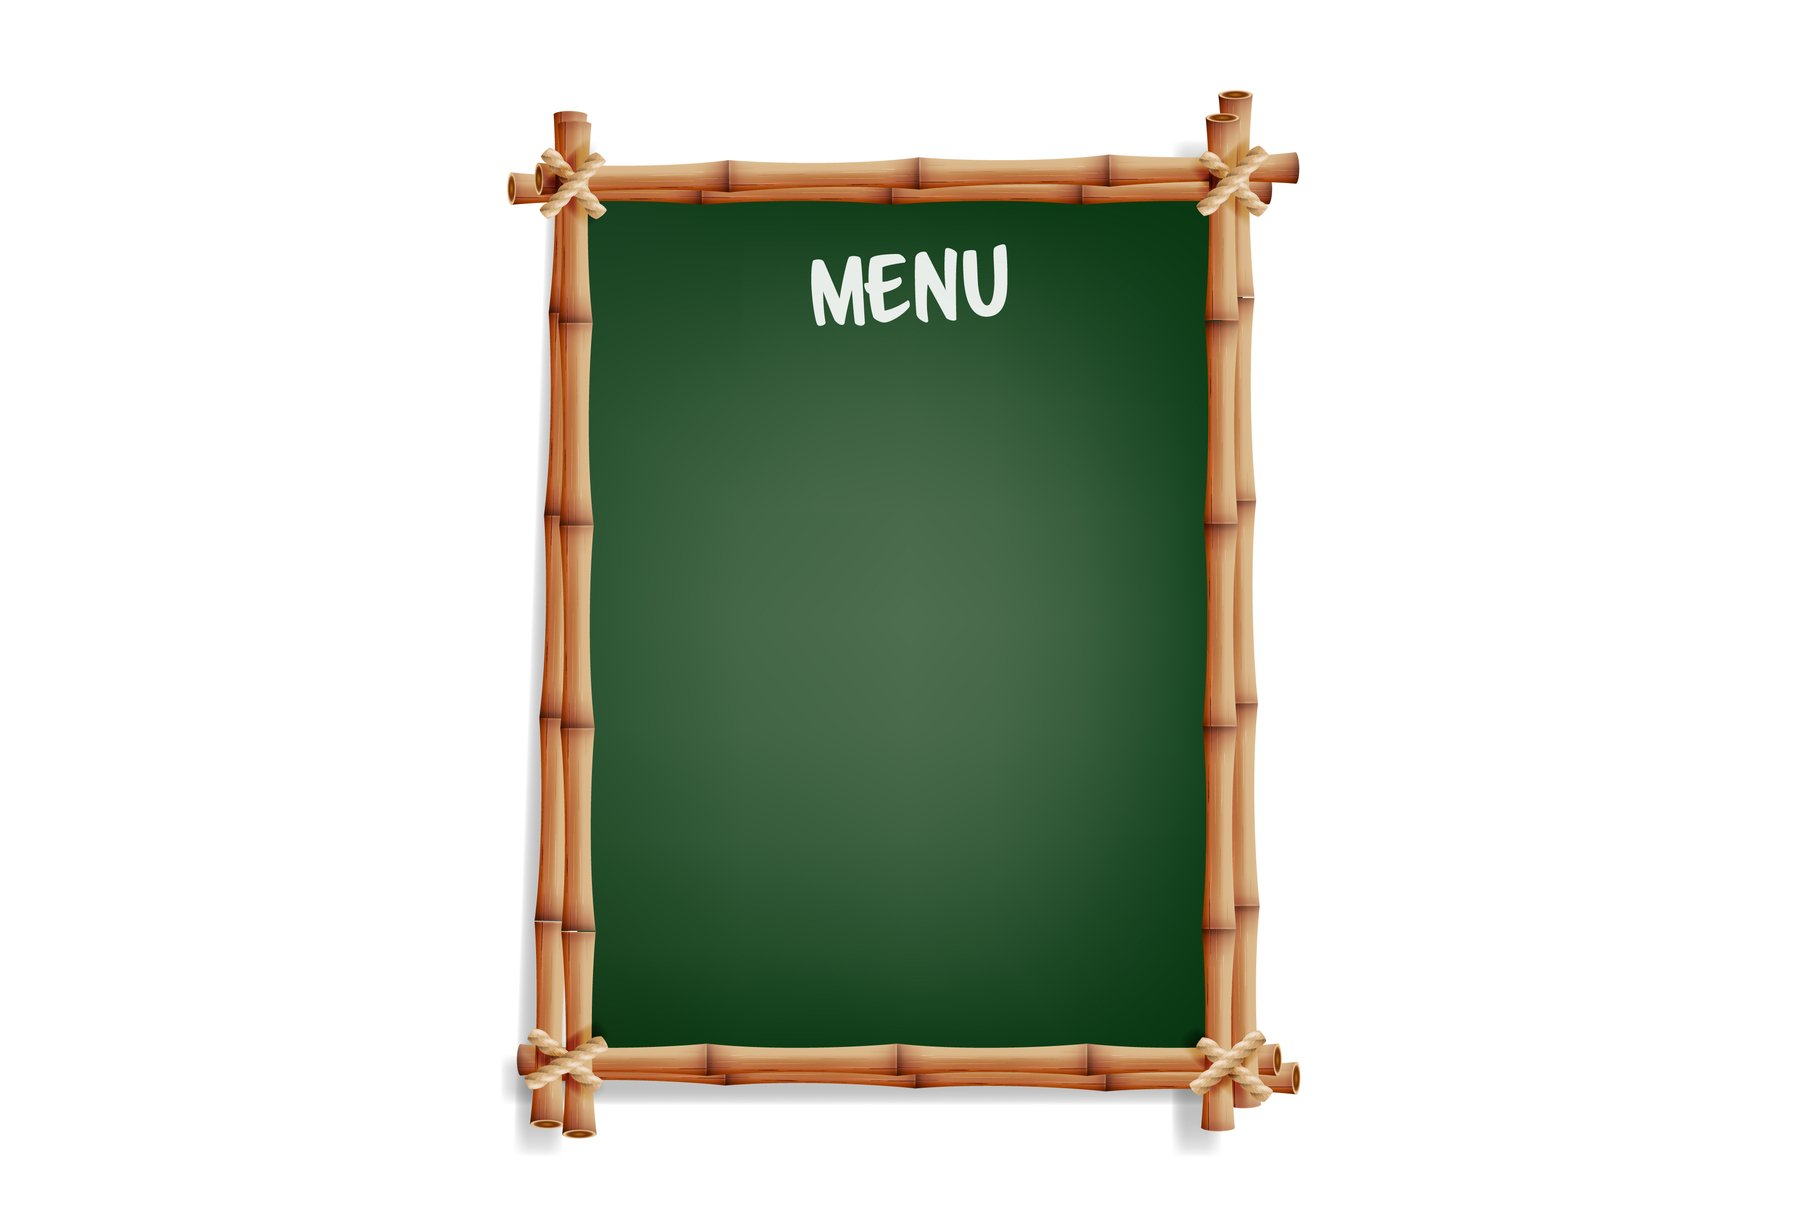 Menu Board. Cafe Or Restaurant Menu Board example image 1